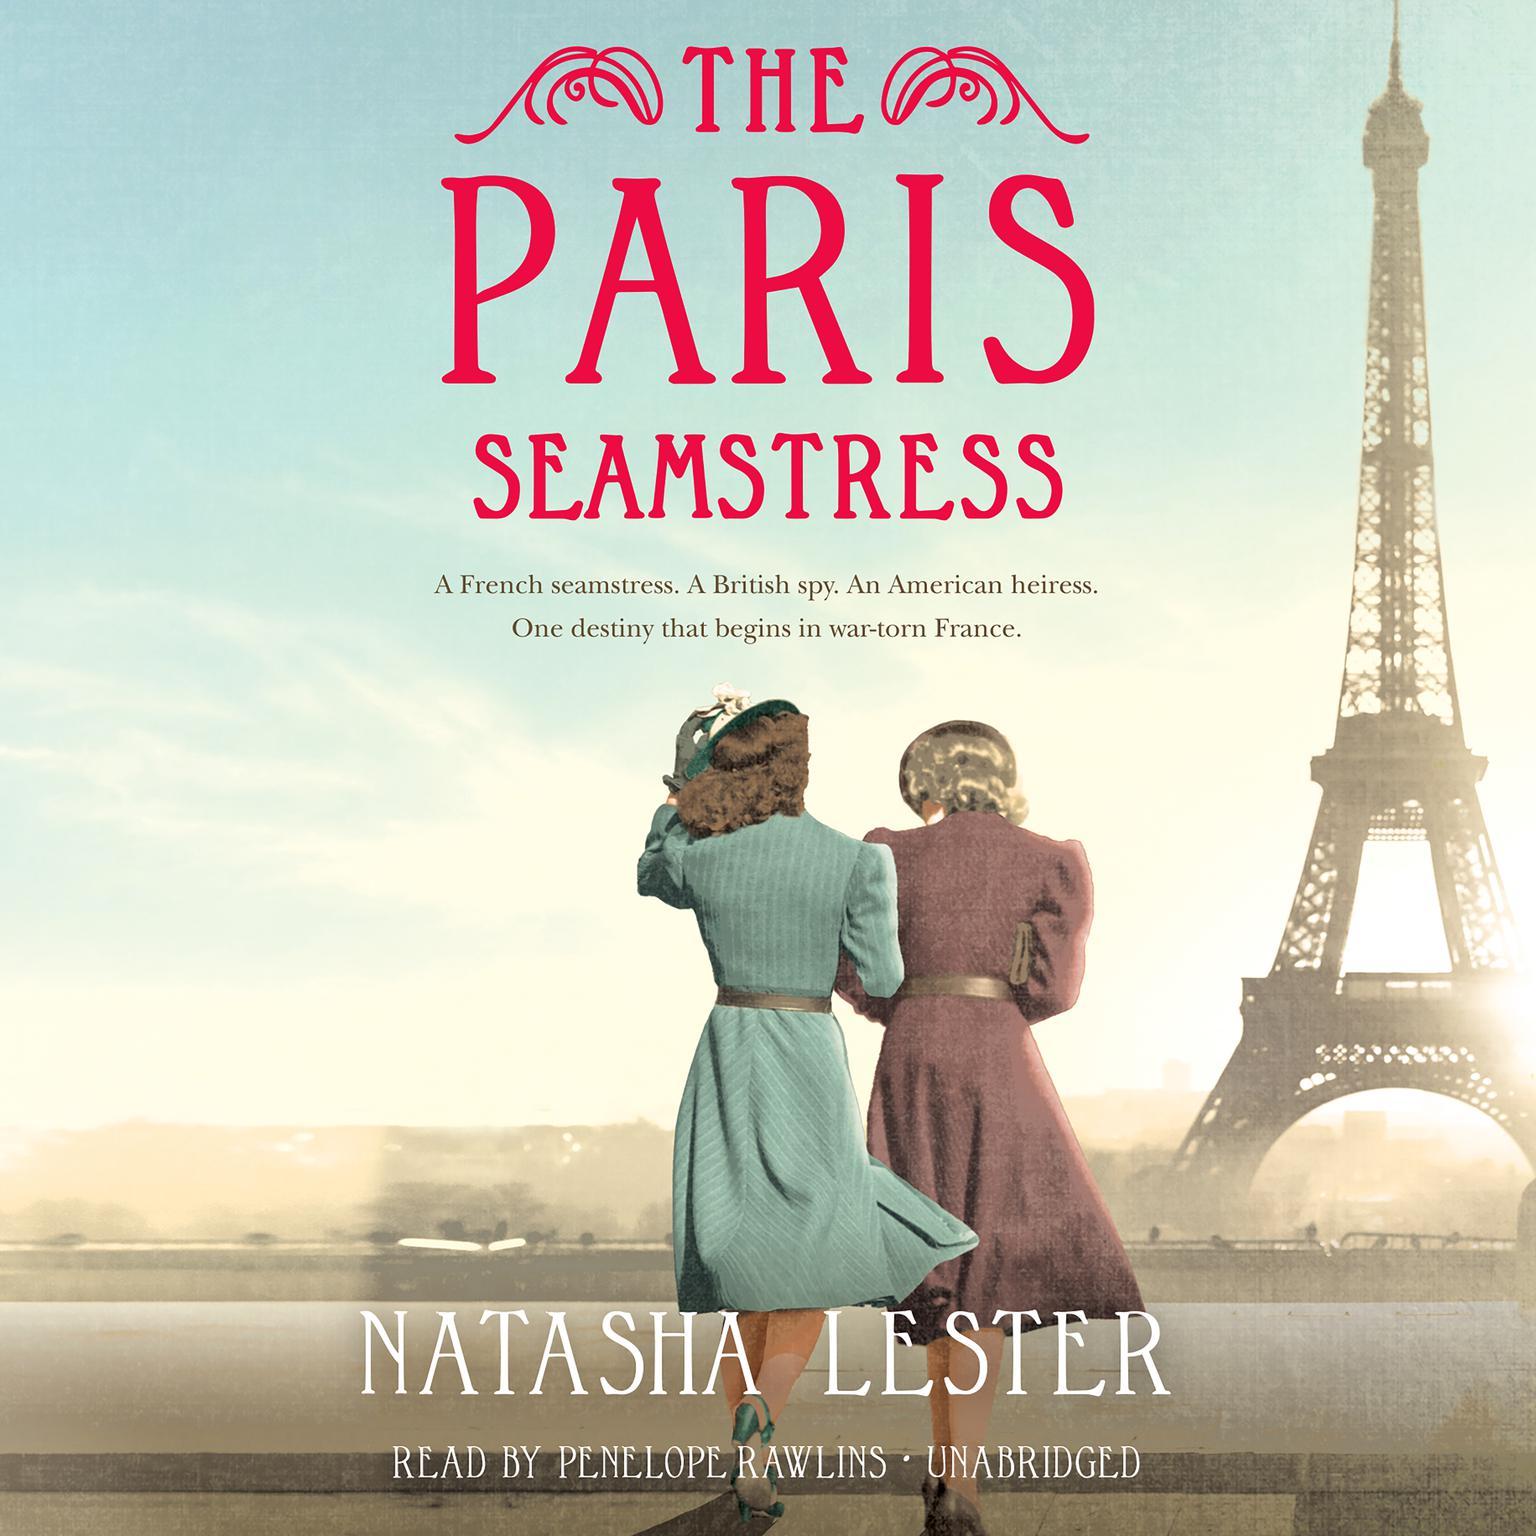 The Paris Seamstress Audiobook, by Natasha Lester